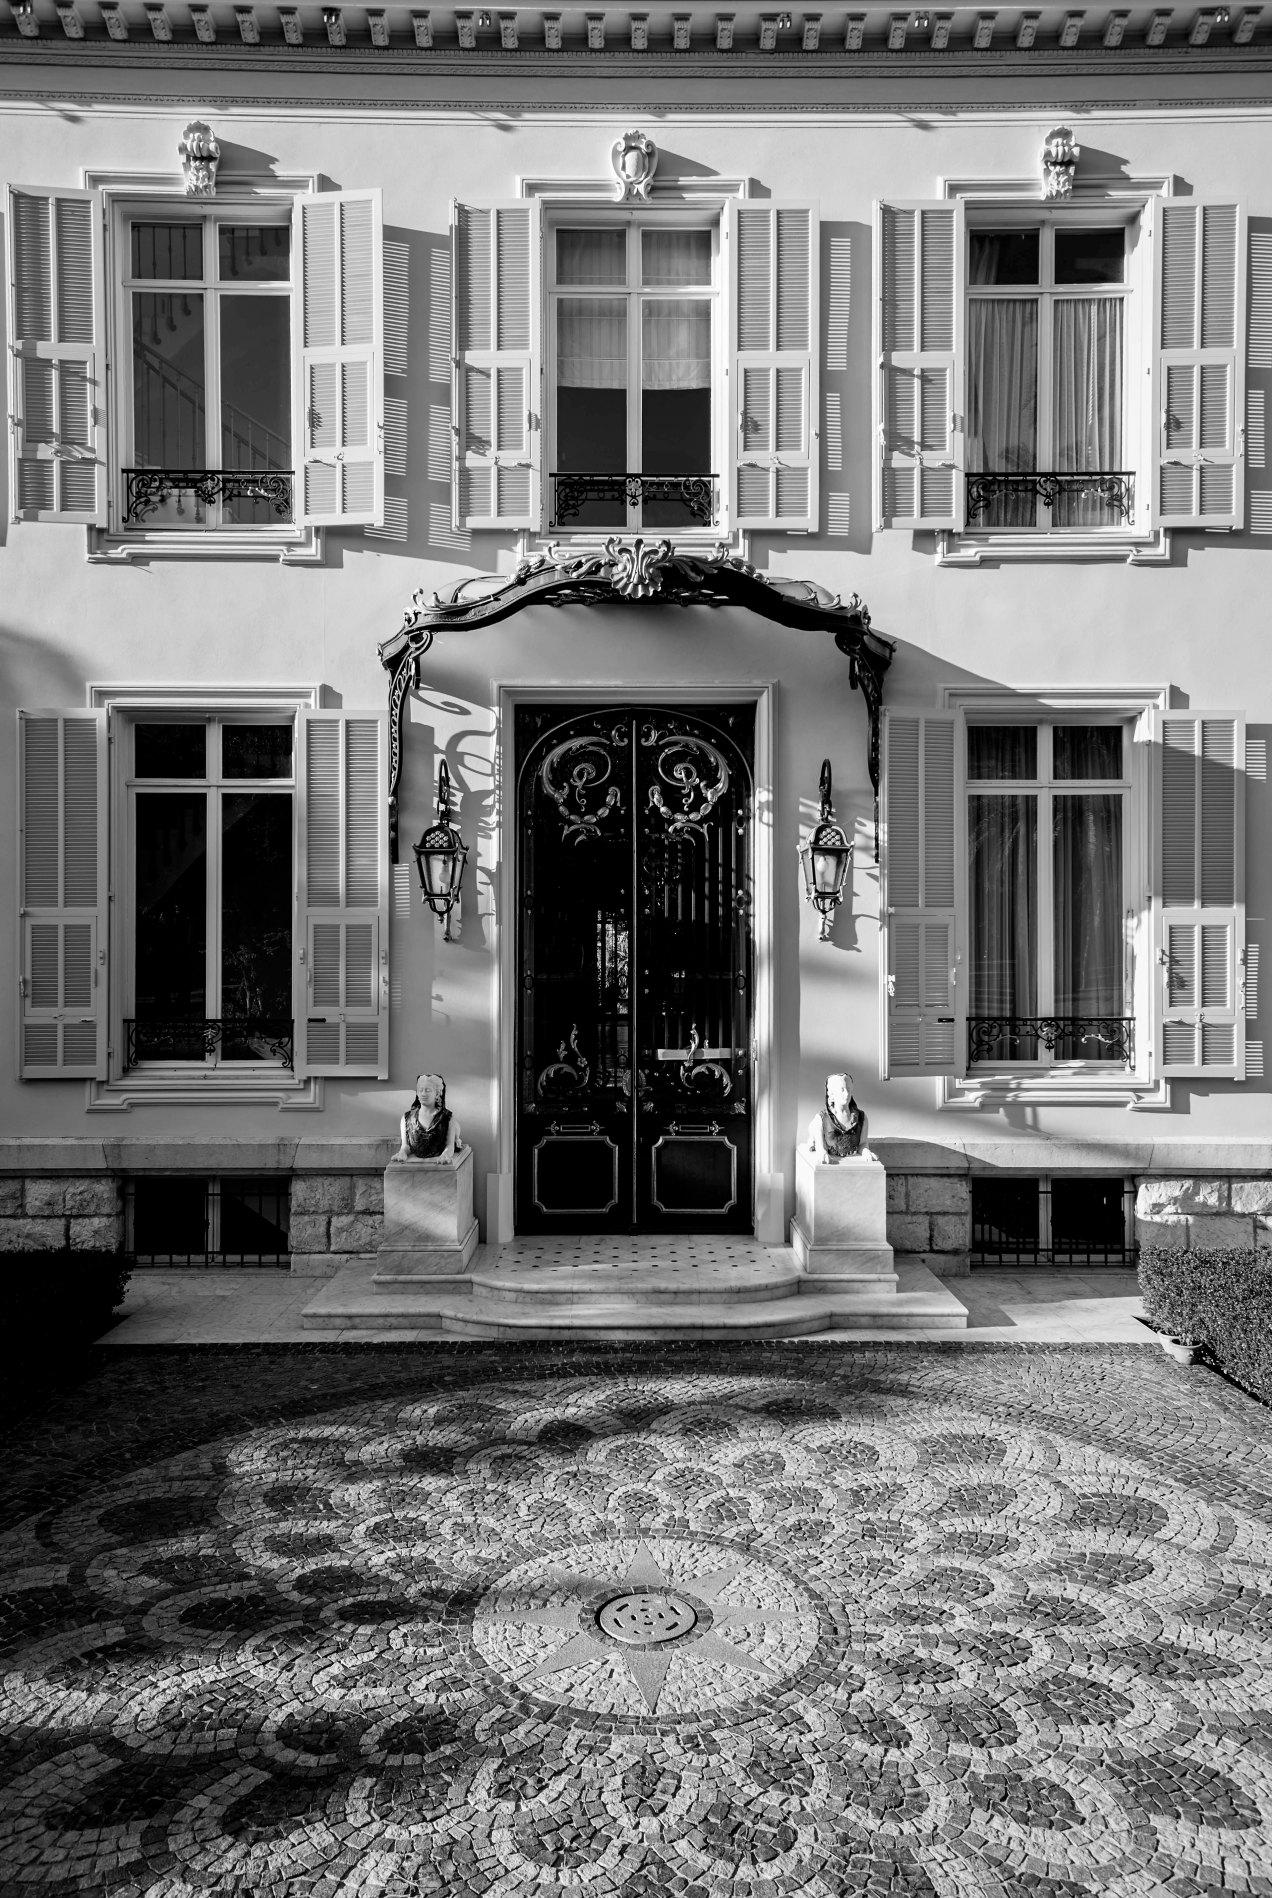 Villa Nellcote, Saint-Jean-cap-Ferrat, gildalliere, 2013